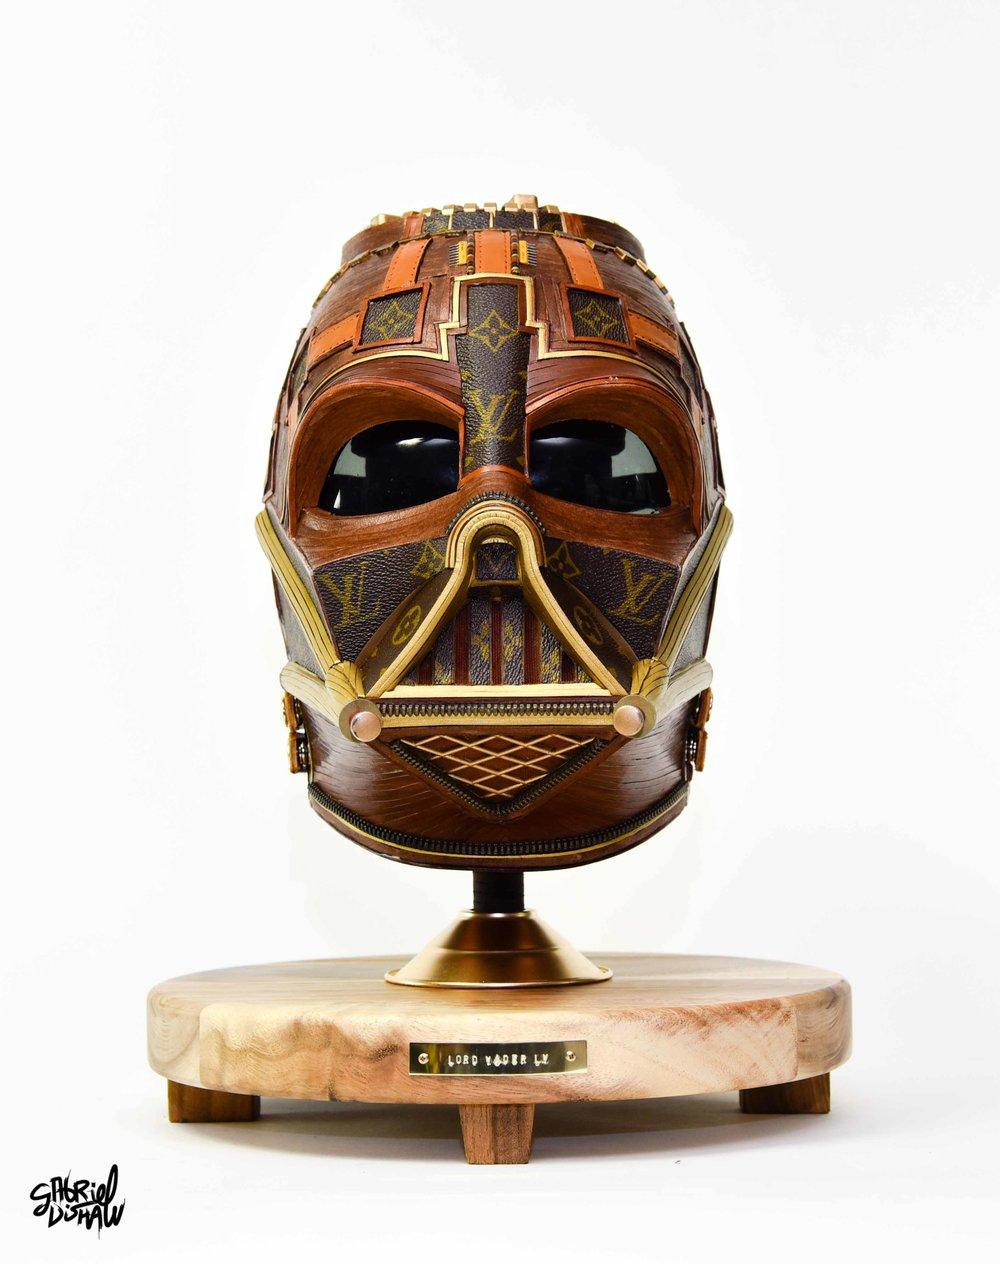 Gabriel Dishaw Lord Vader LV-5990.jpg